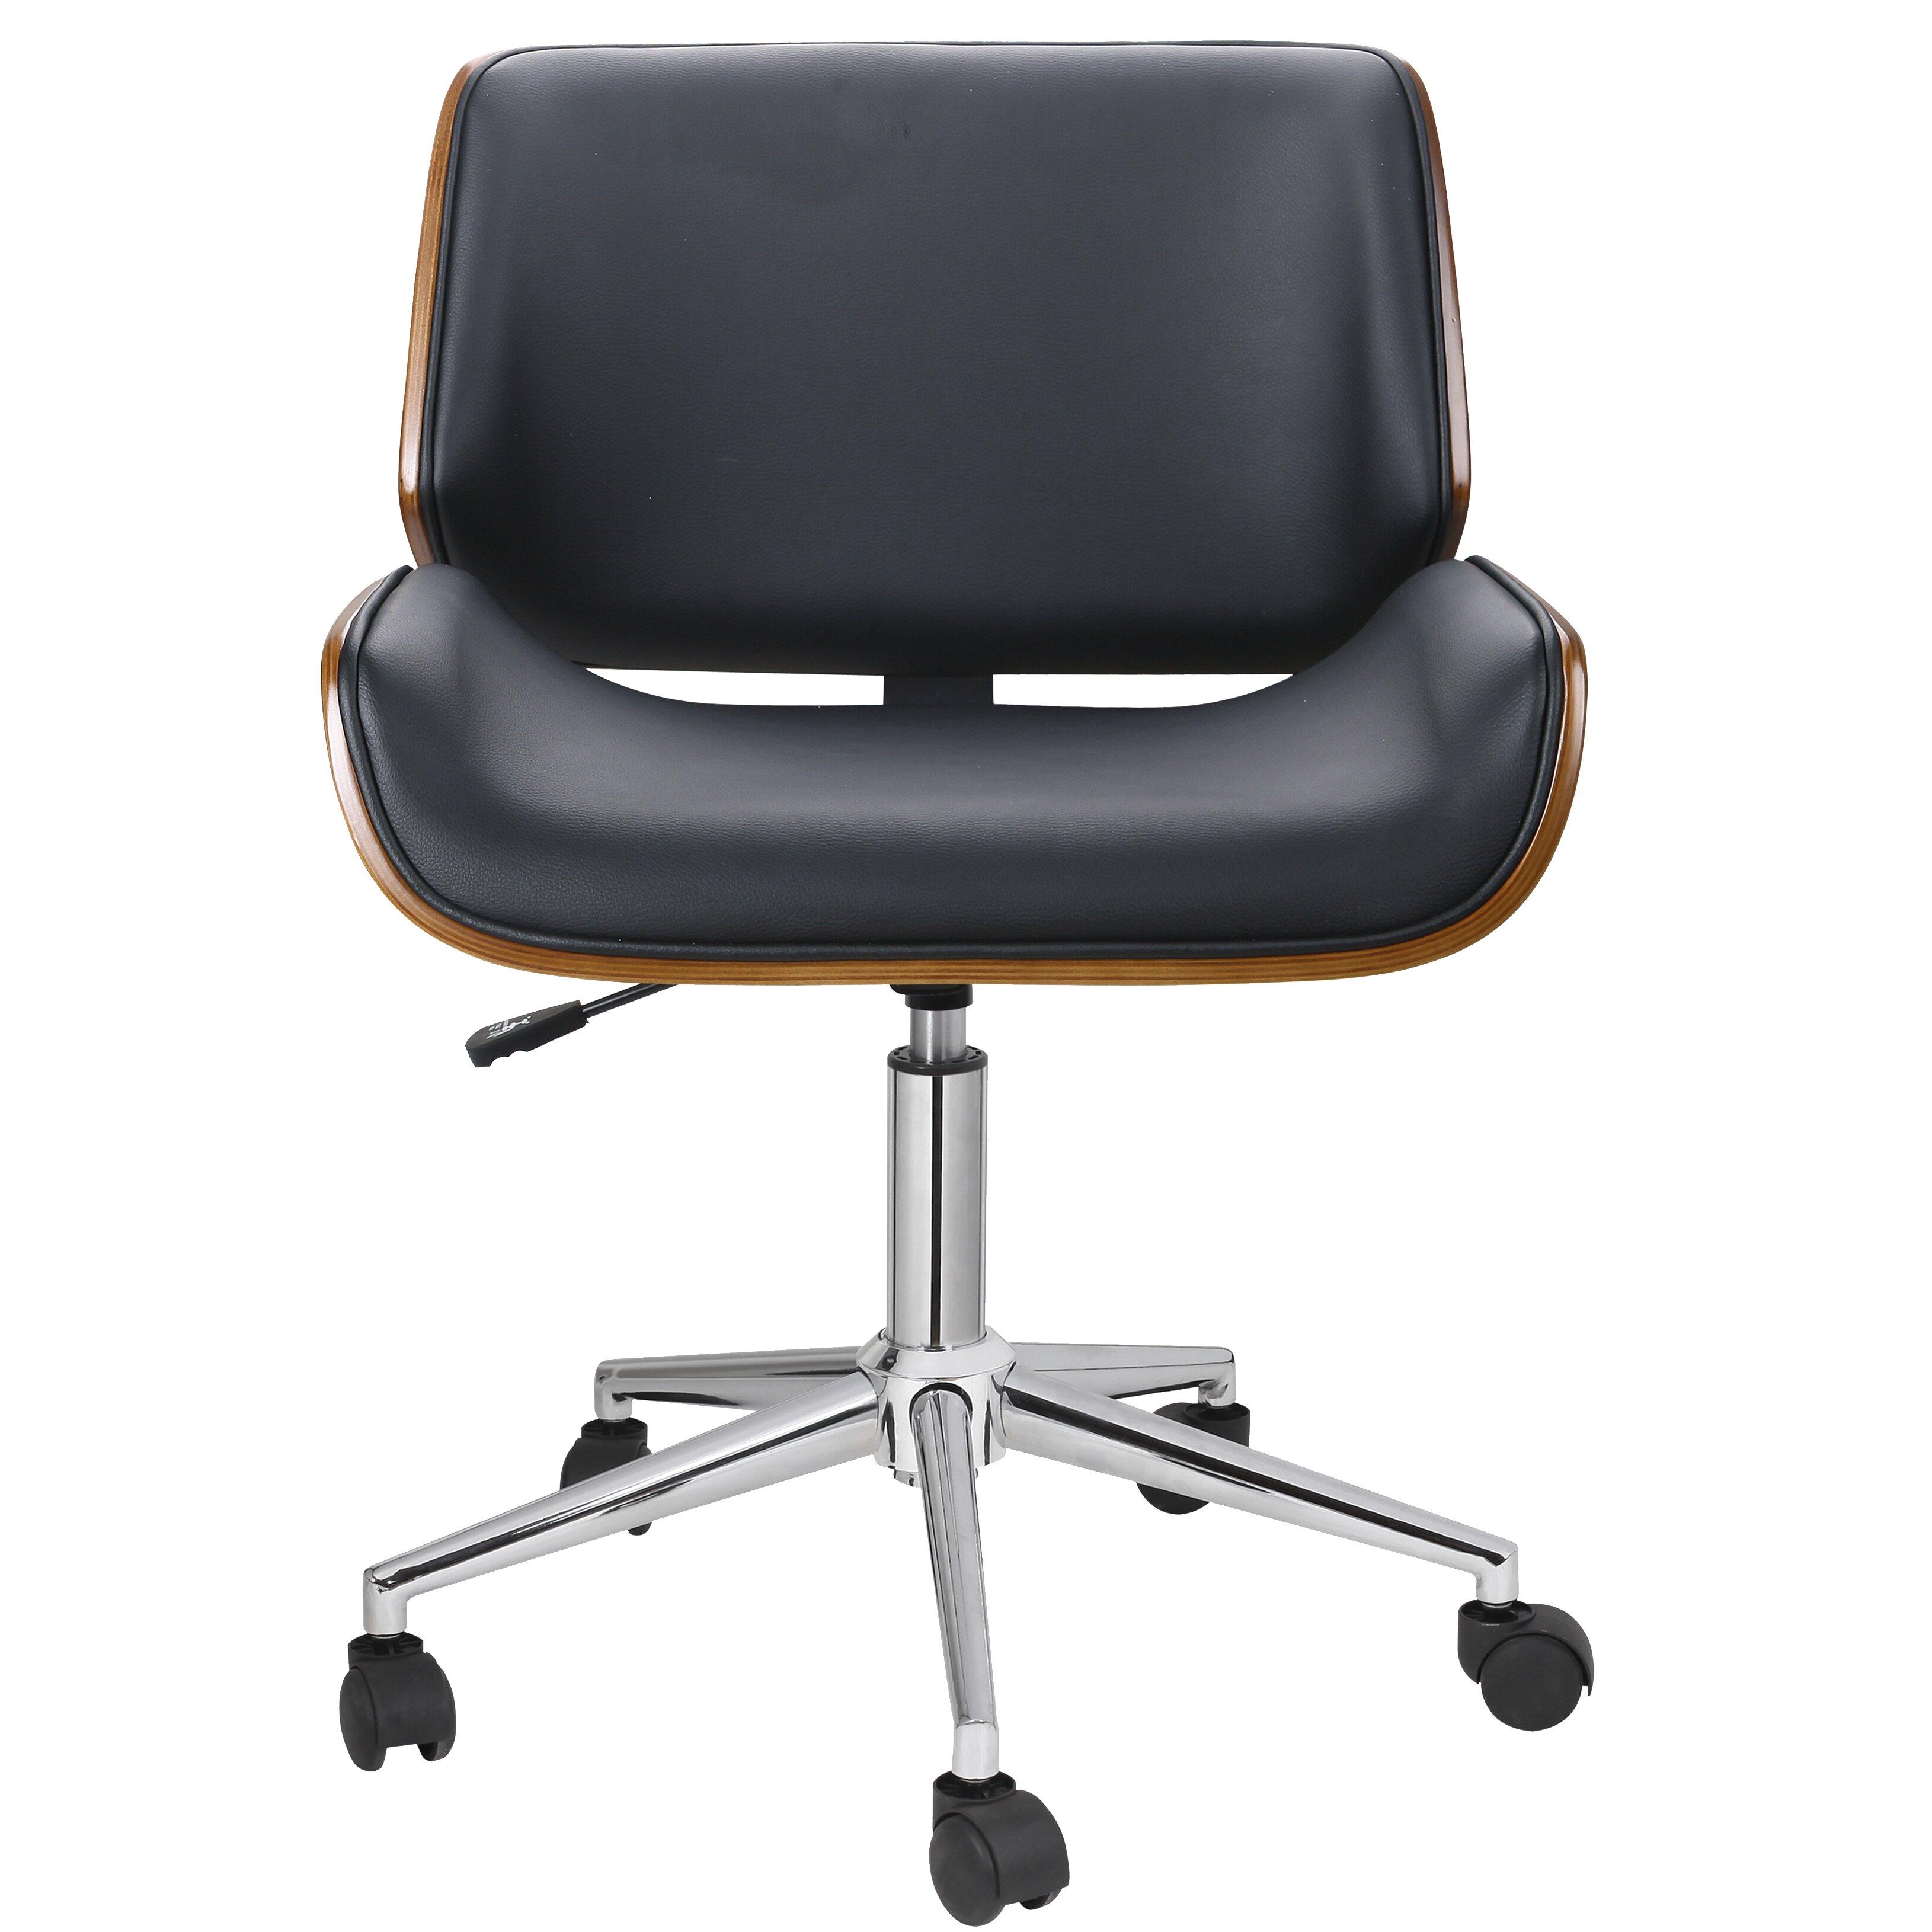 dove desk chair - Best Office Chair Under 200